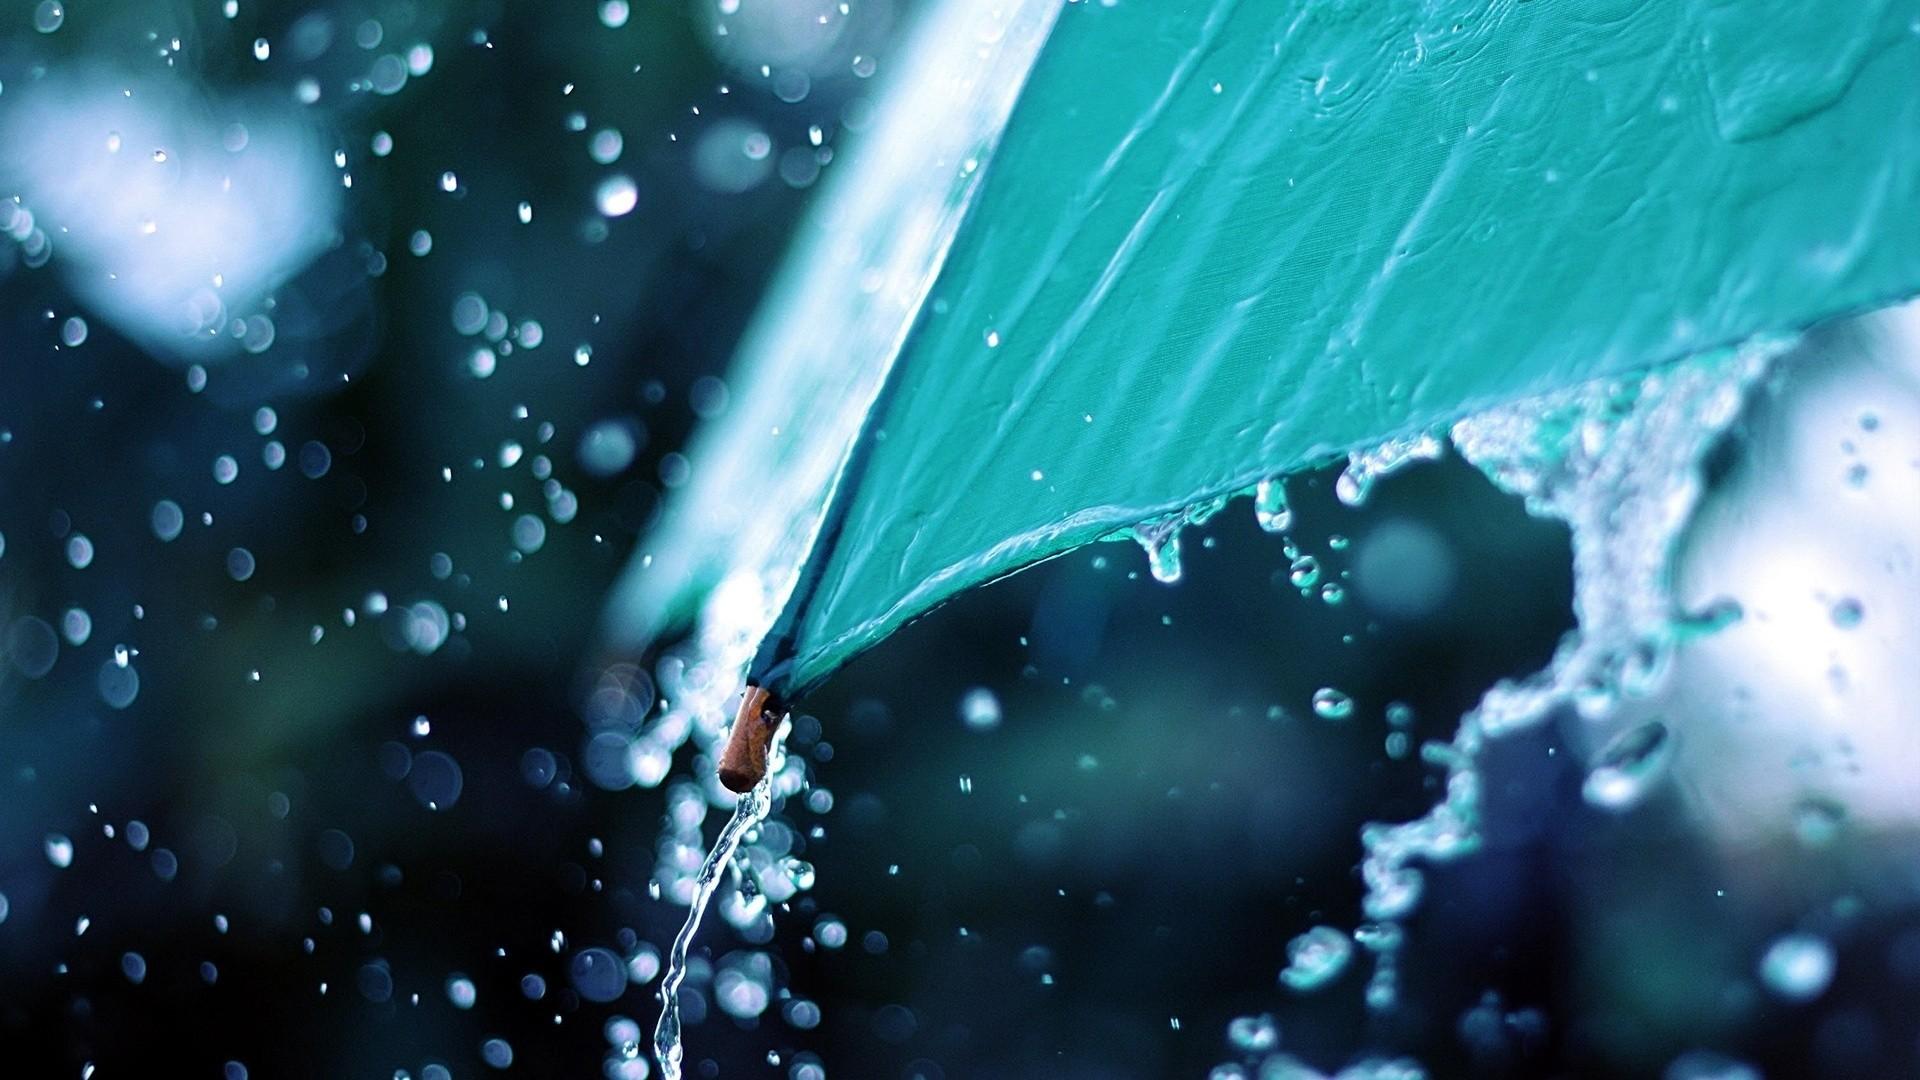 Rain Free Wallpaper